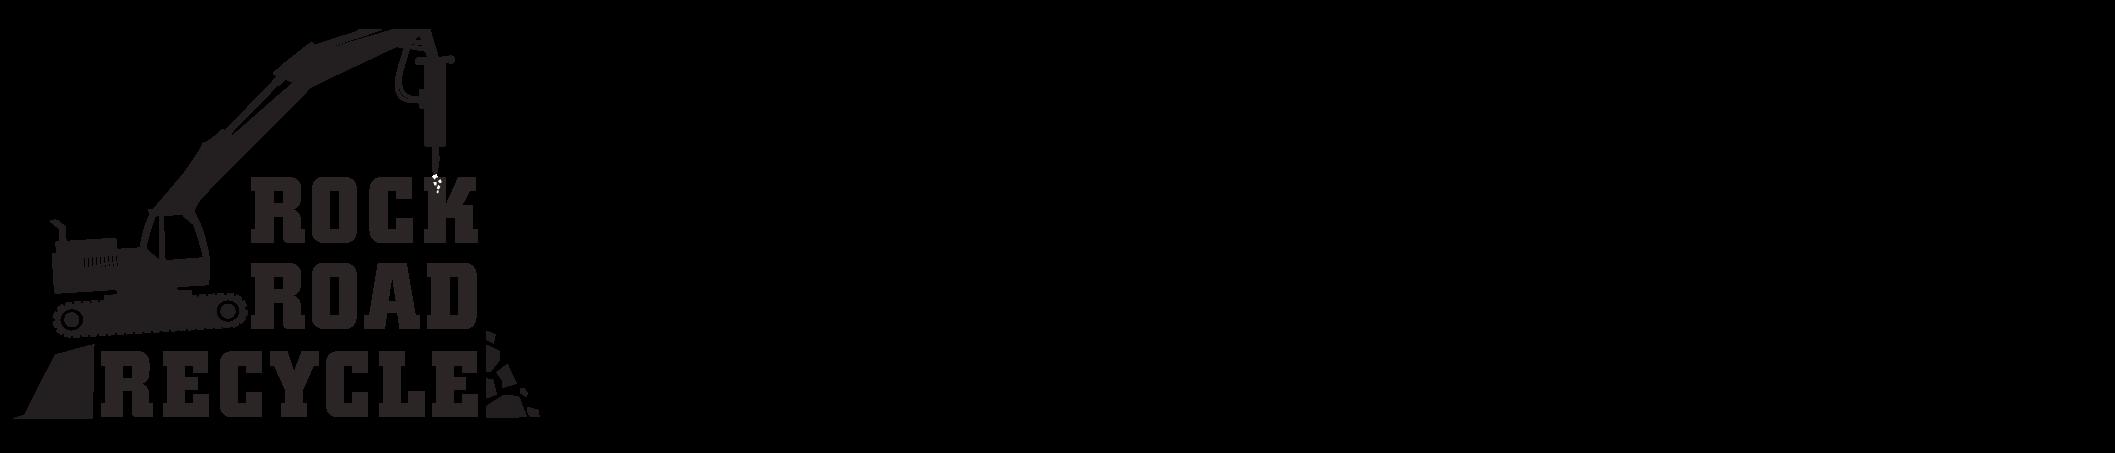 RRR_logo_TAGLINE